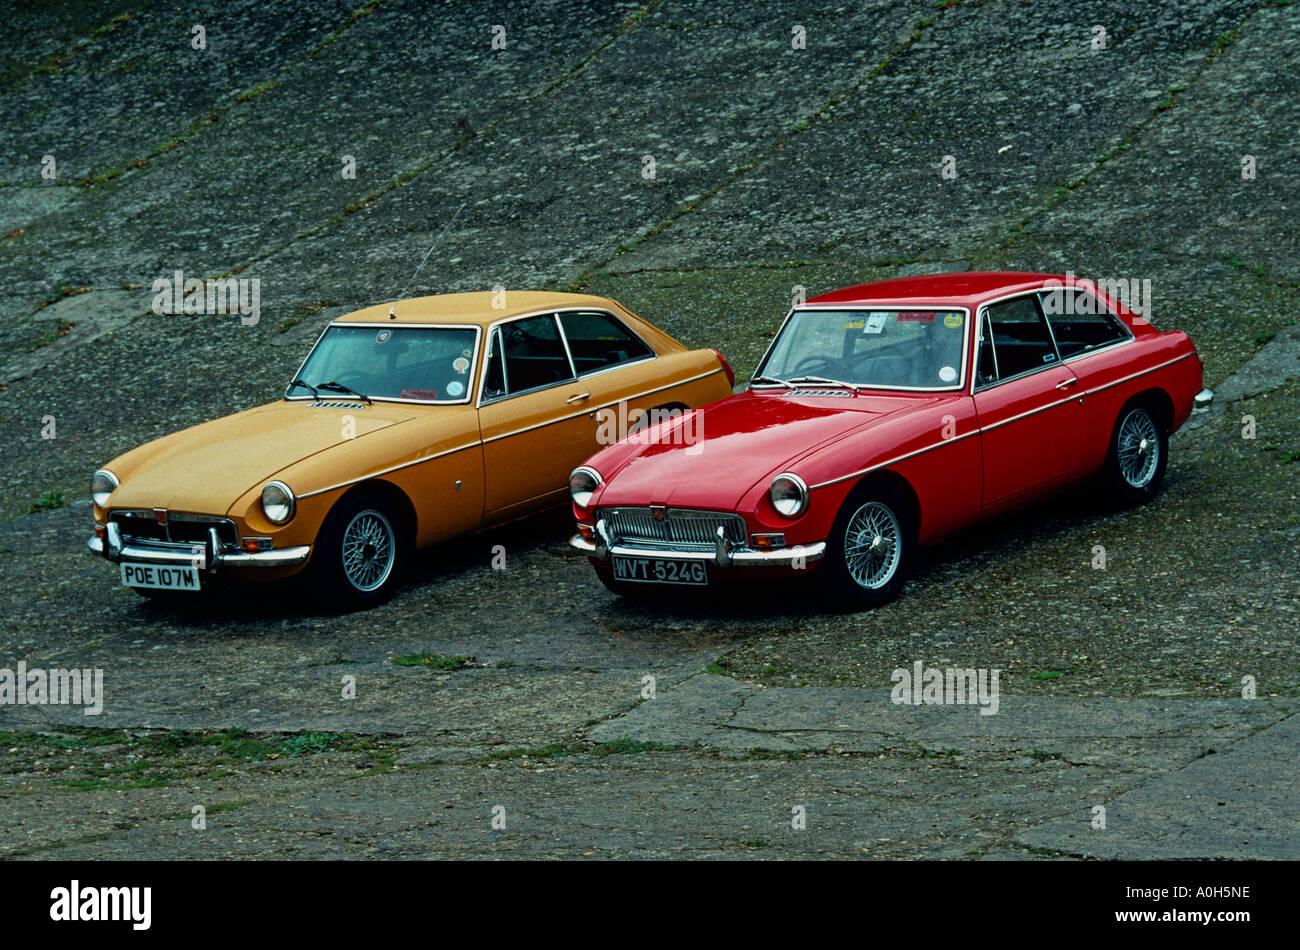 MG BGT. Introduced 1965 - Stock Image